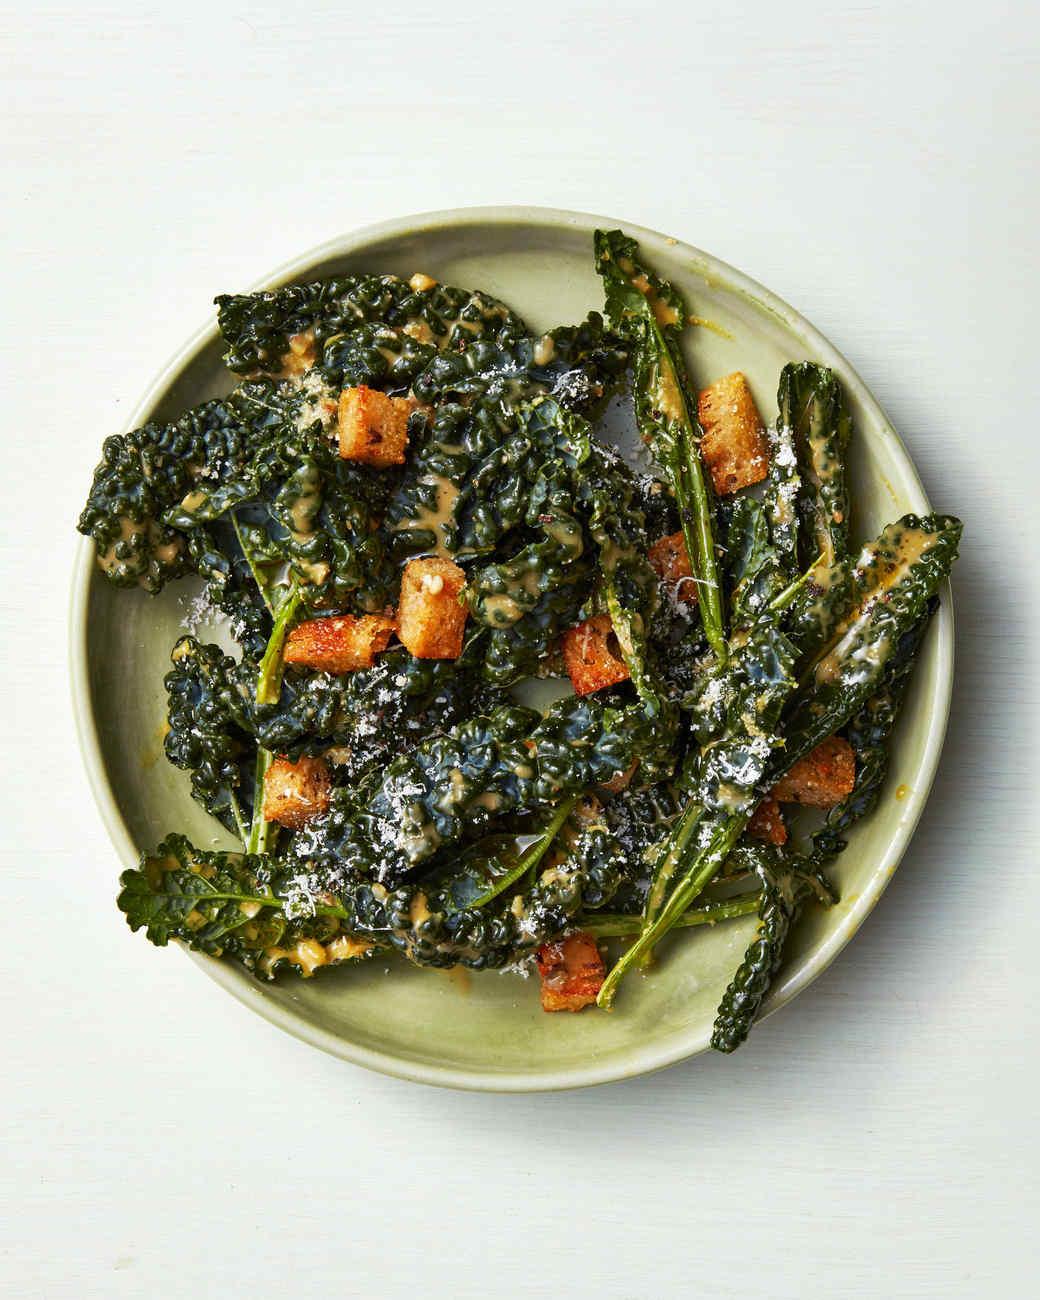 kale-caesar-salad-388-d113096-1.jpg